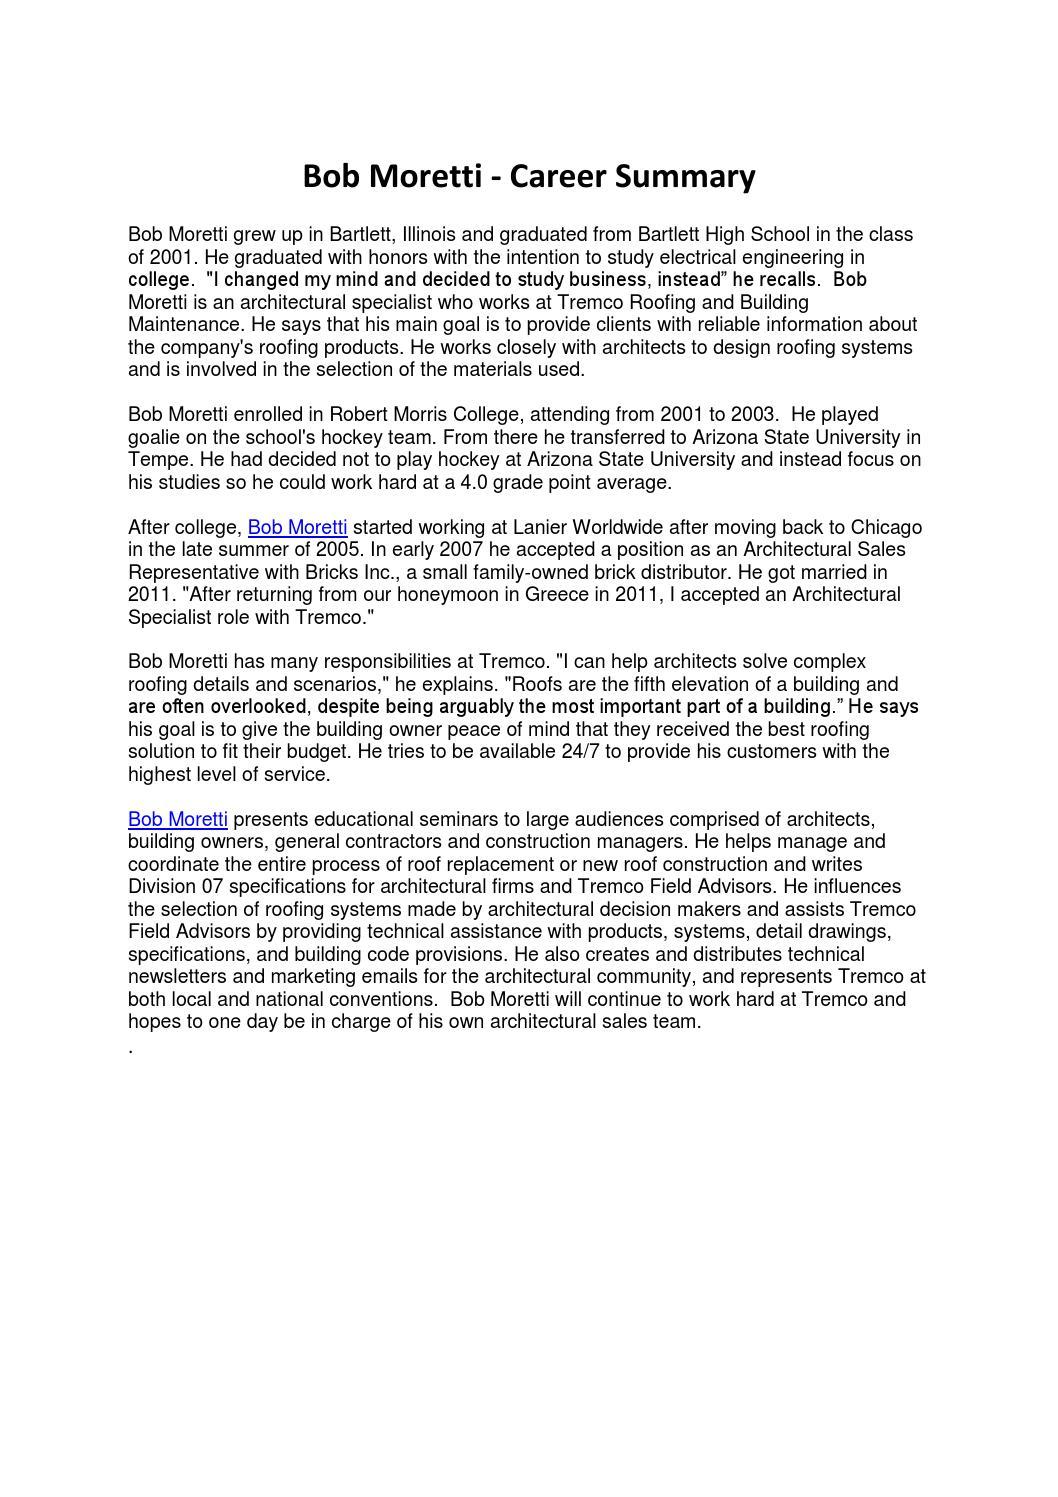 Bob Moretti - Career Summary by pzmediainc - issuu